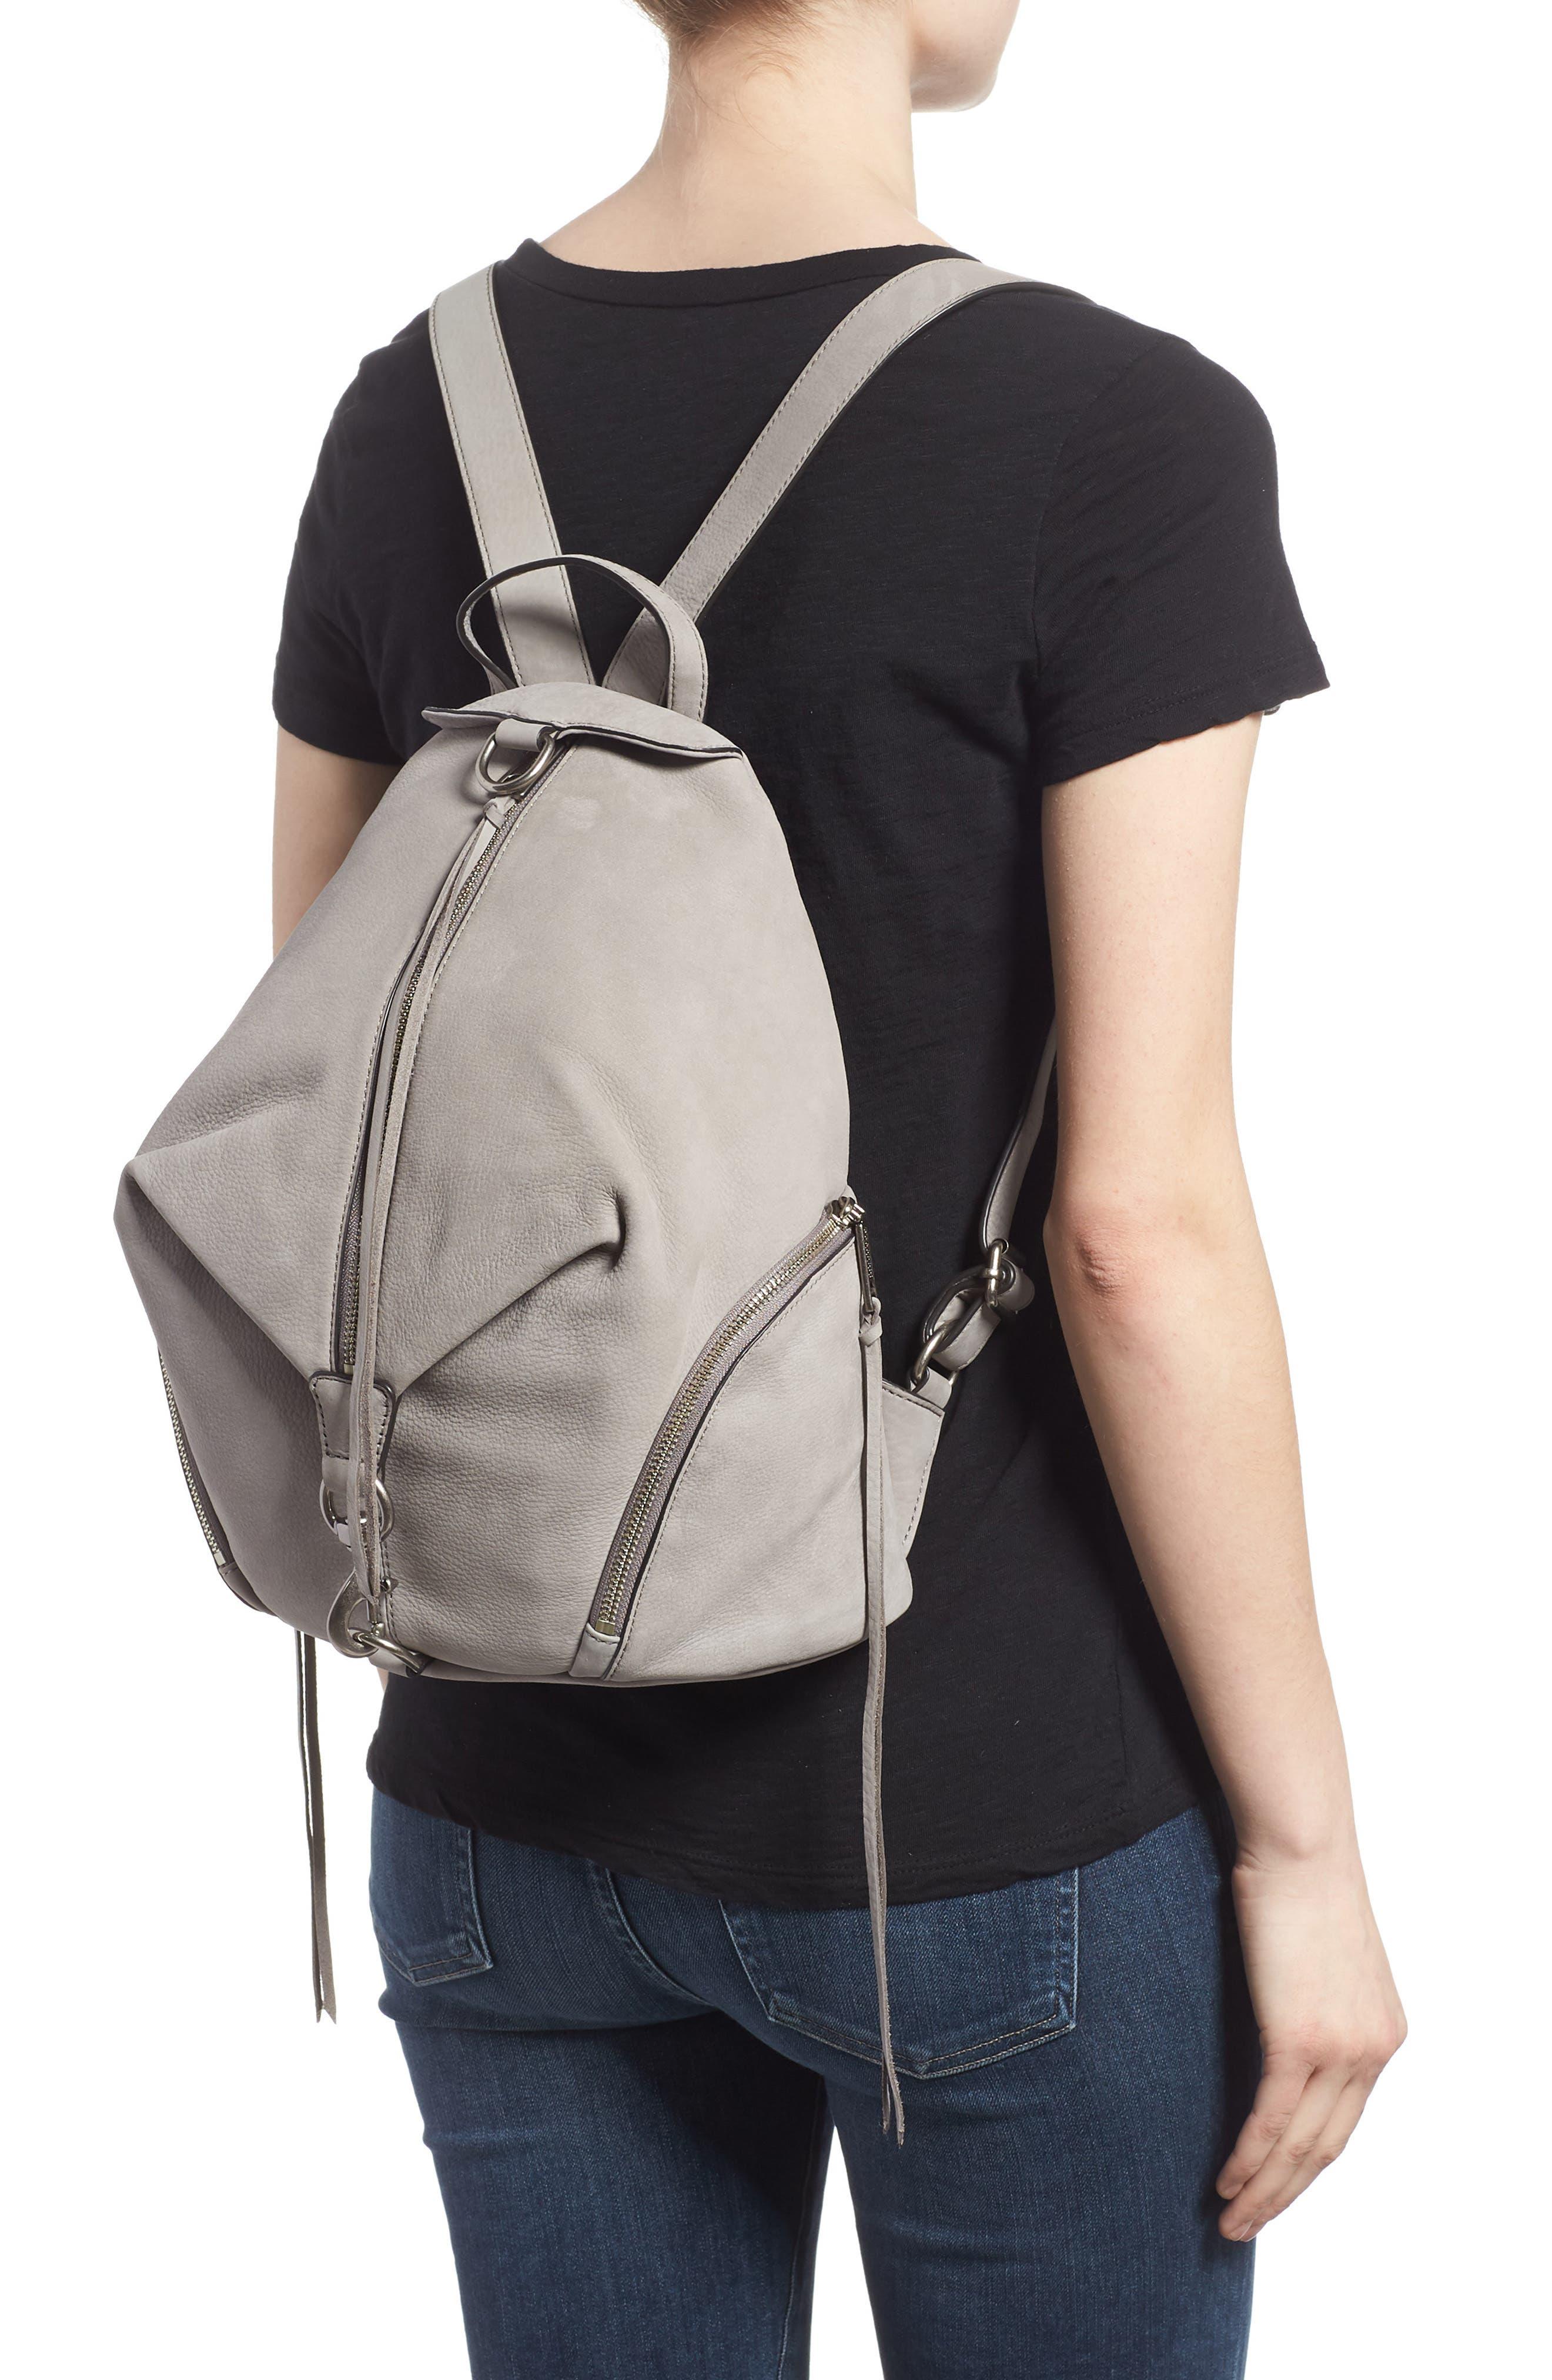 Julian Nubuck Leather Backpack,                             Alternate thumbnail 2, color,                             GREY